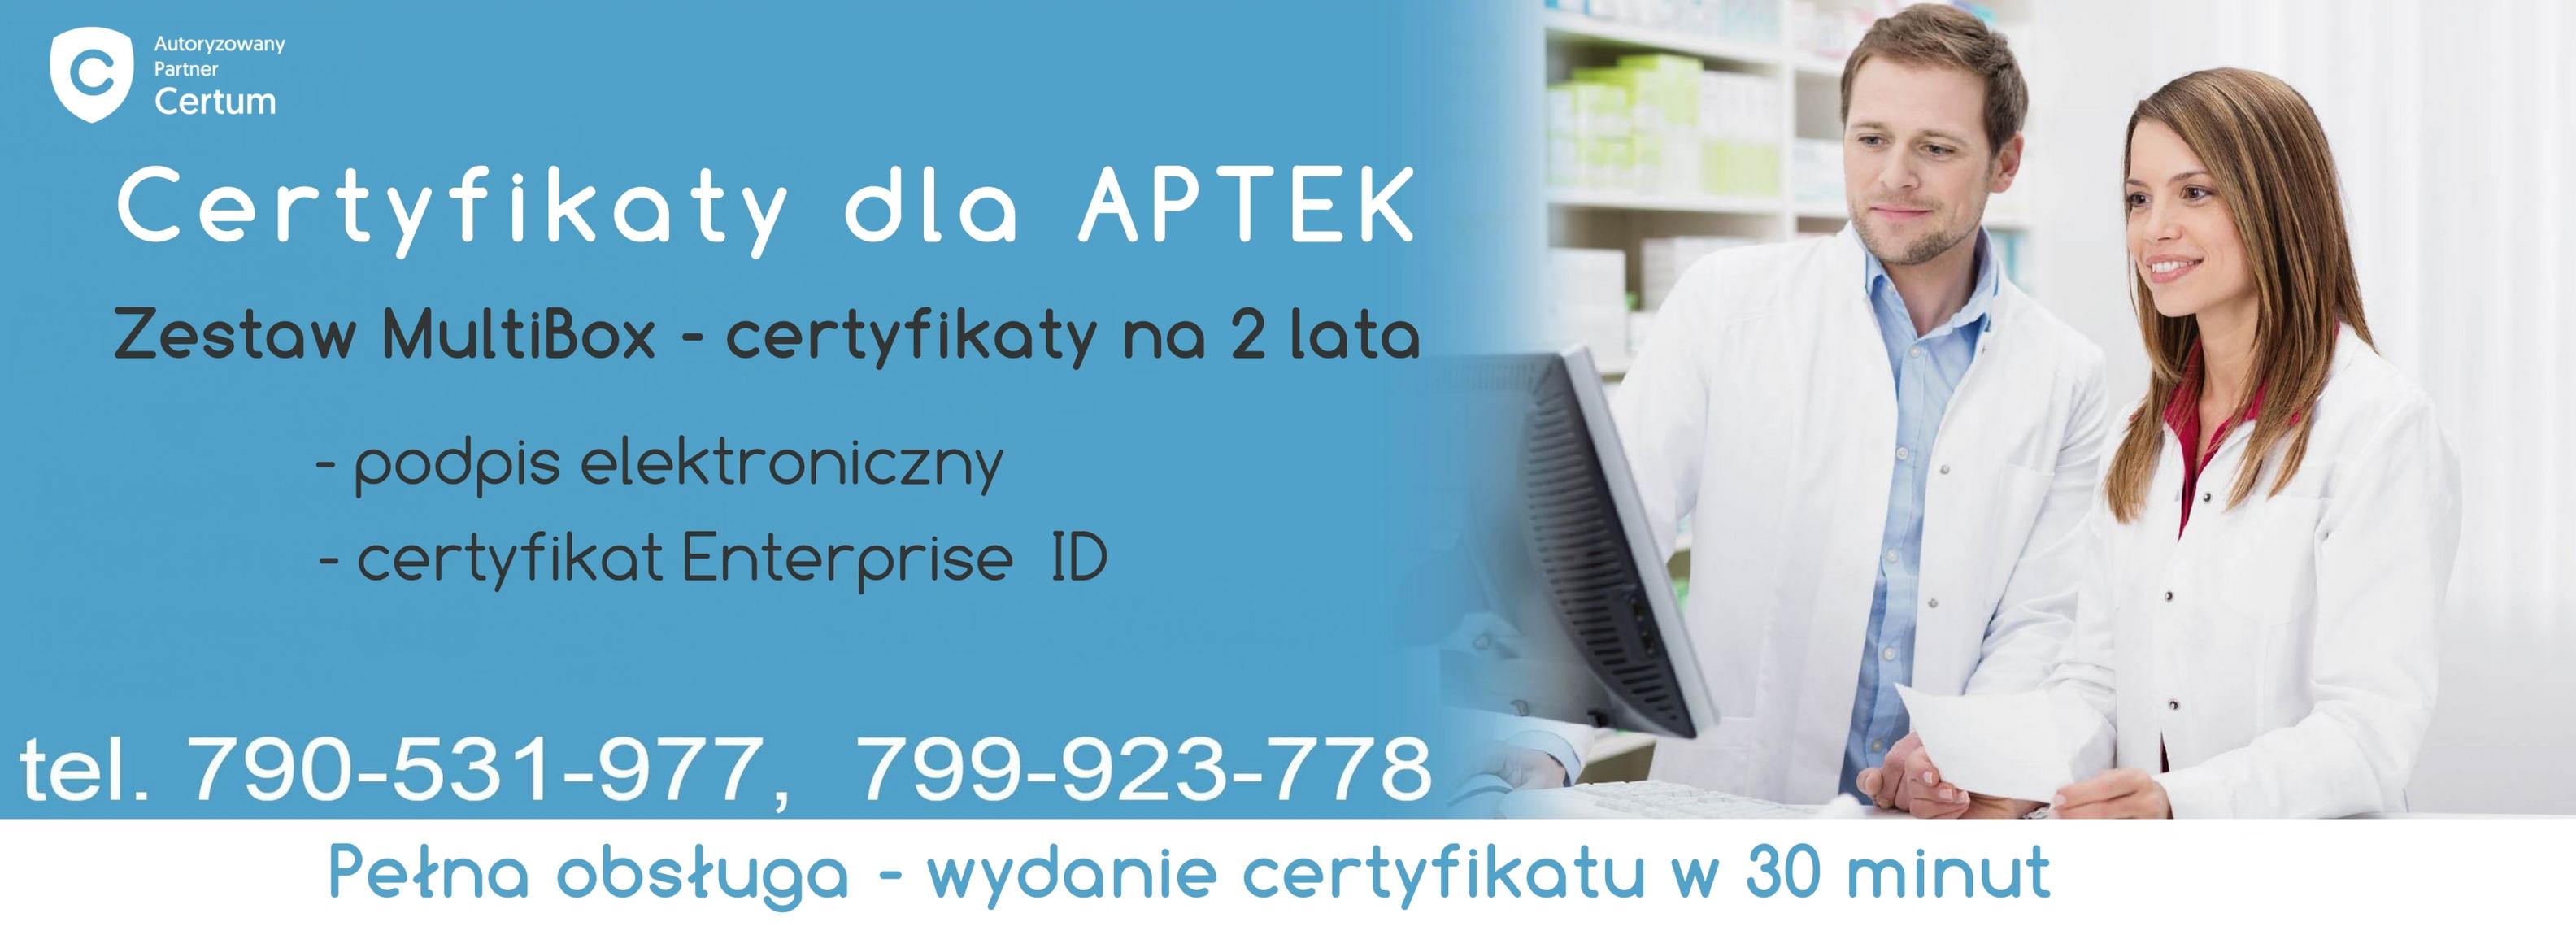 certyfikat dla aptek